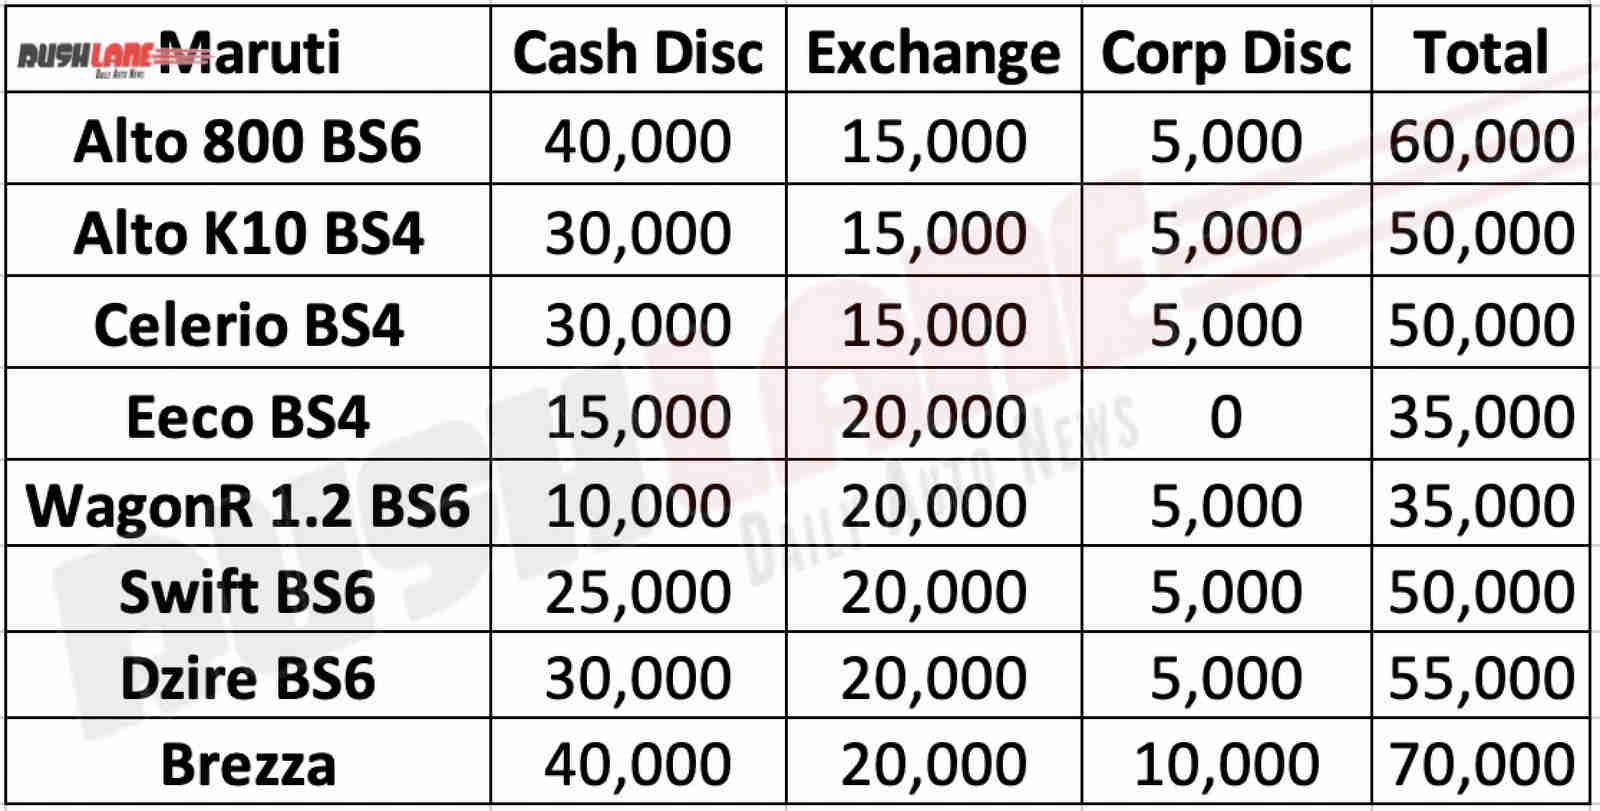 Maruti Discount offers Dec 2019